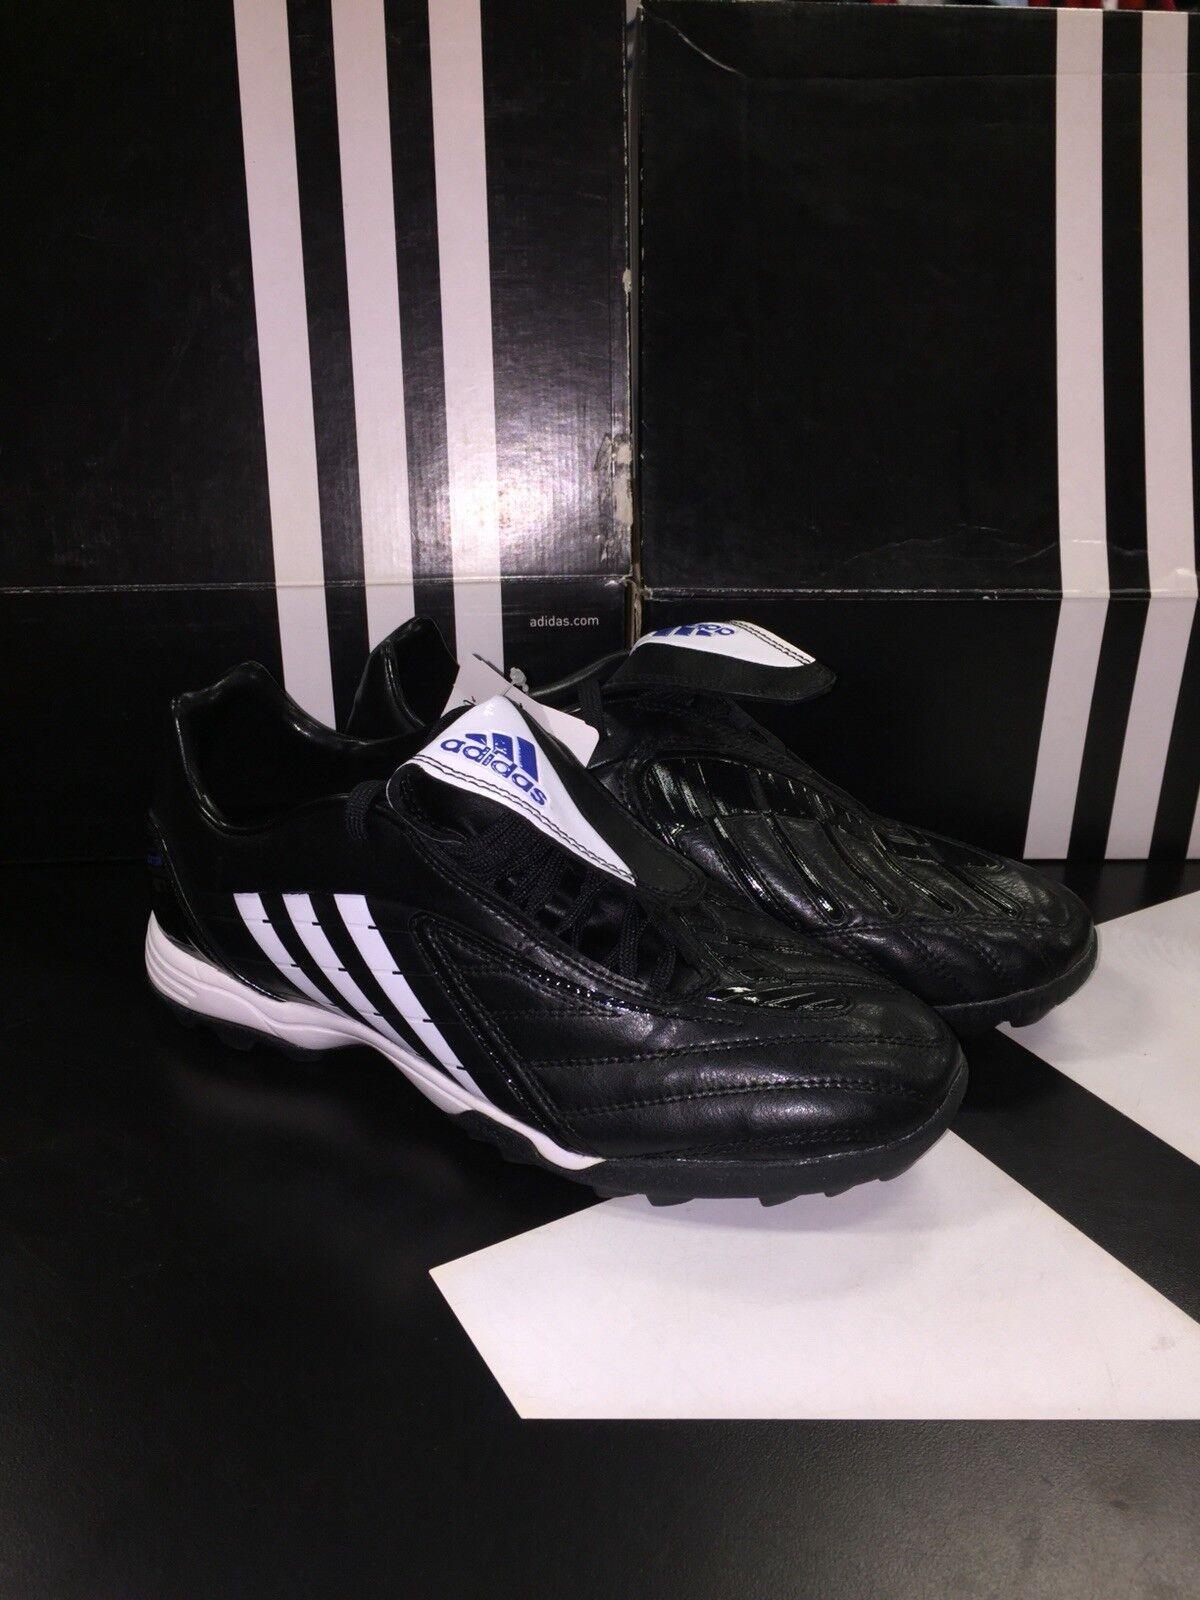 Adidas Predator Powerswerve Absolado Turf 2006-2007 Retro Boots US 7 7.5